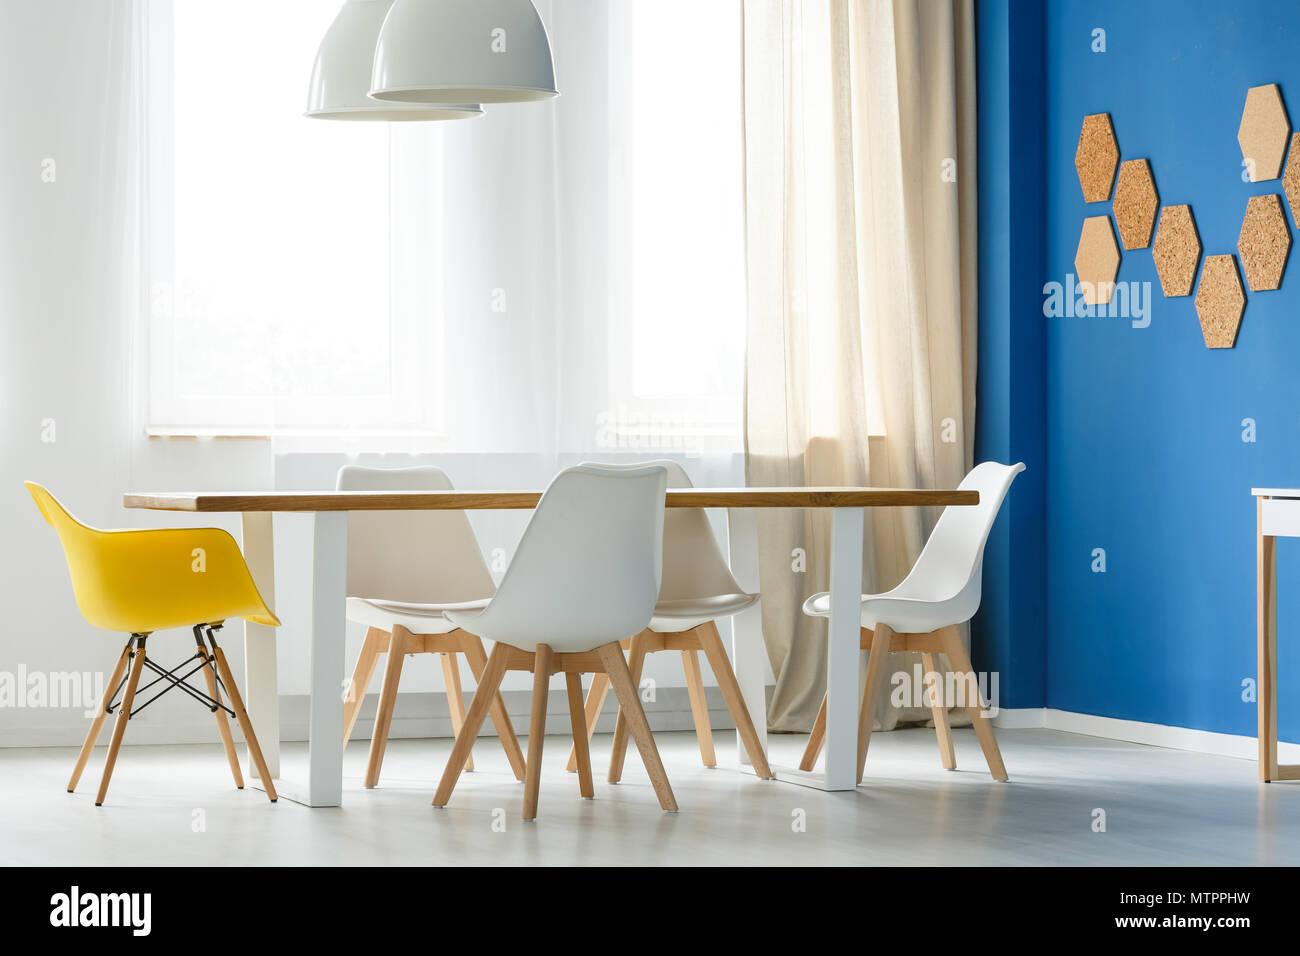 Tremendous Multifunctional Scandinavian Home Interior With Communal Theyellowbook Wood Chair Design Ideas Theyellowbookinfo